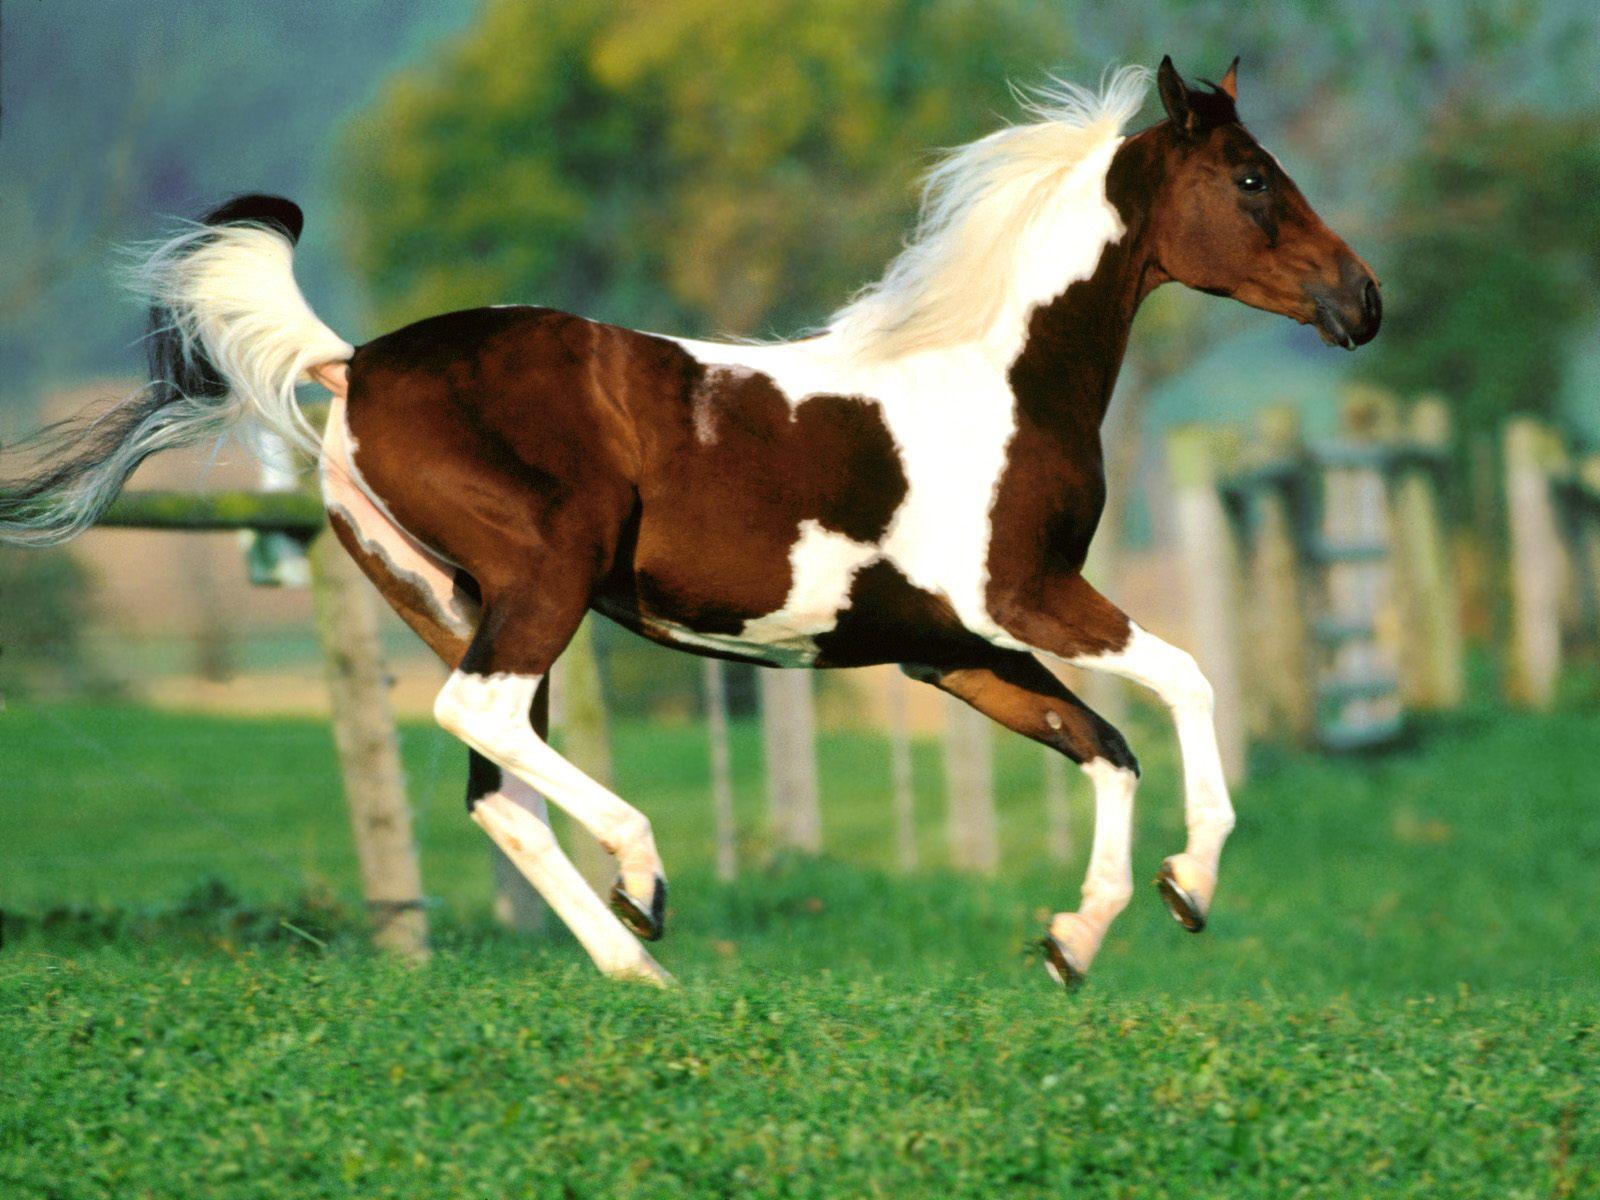 Beautiful   Wallpaper Horse Laptop - 1269137800-XFS97P7  Graphic_13834.jpg